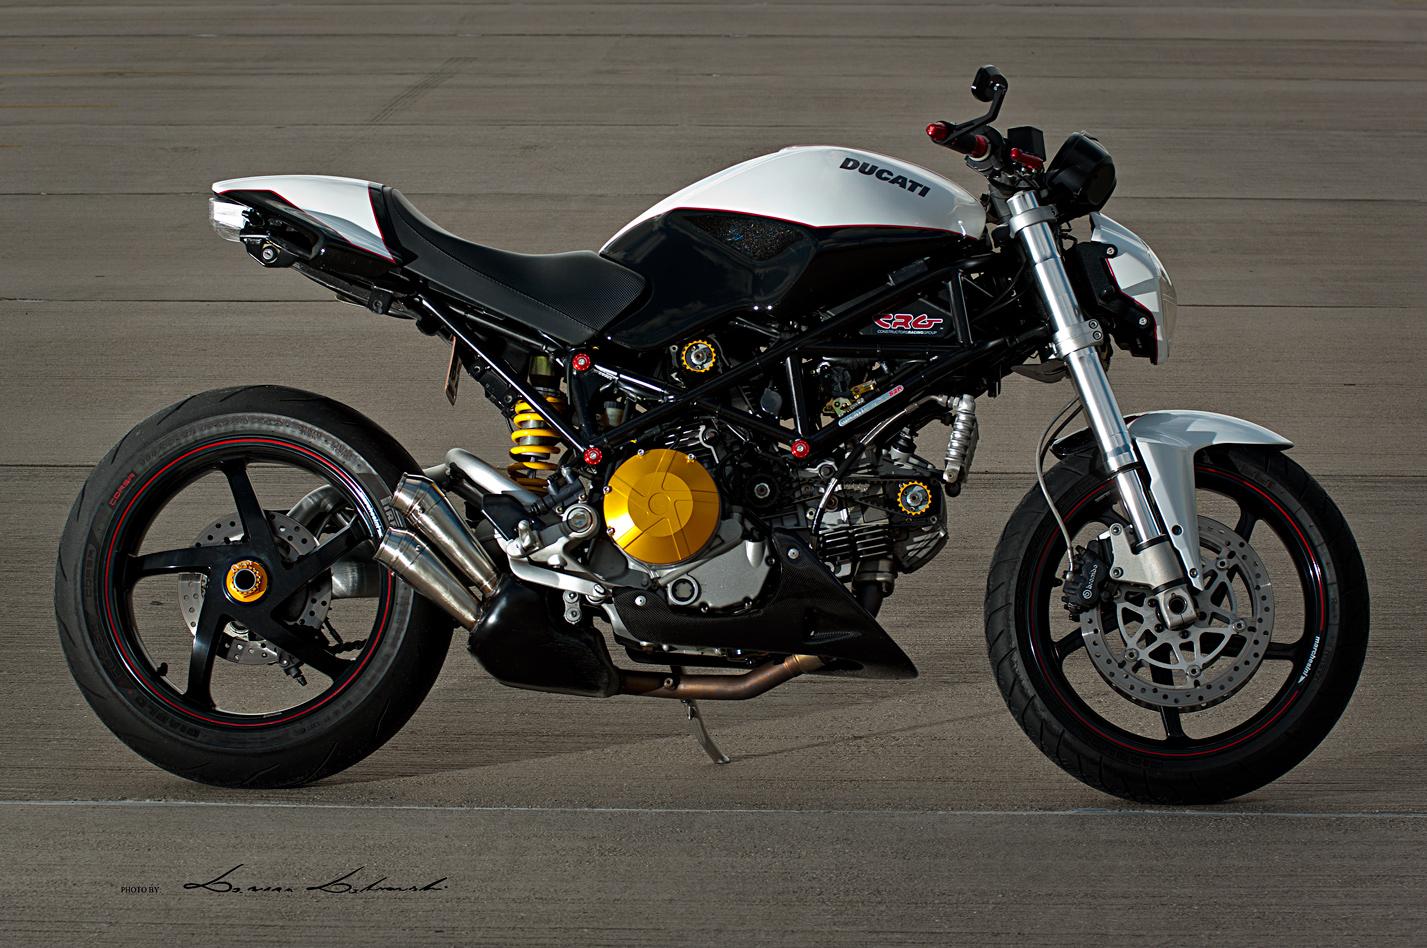 Custom Parts Ducati Monster Custom Parts border=